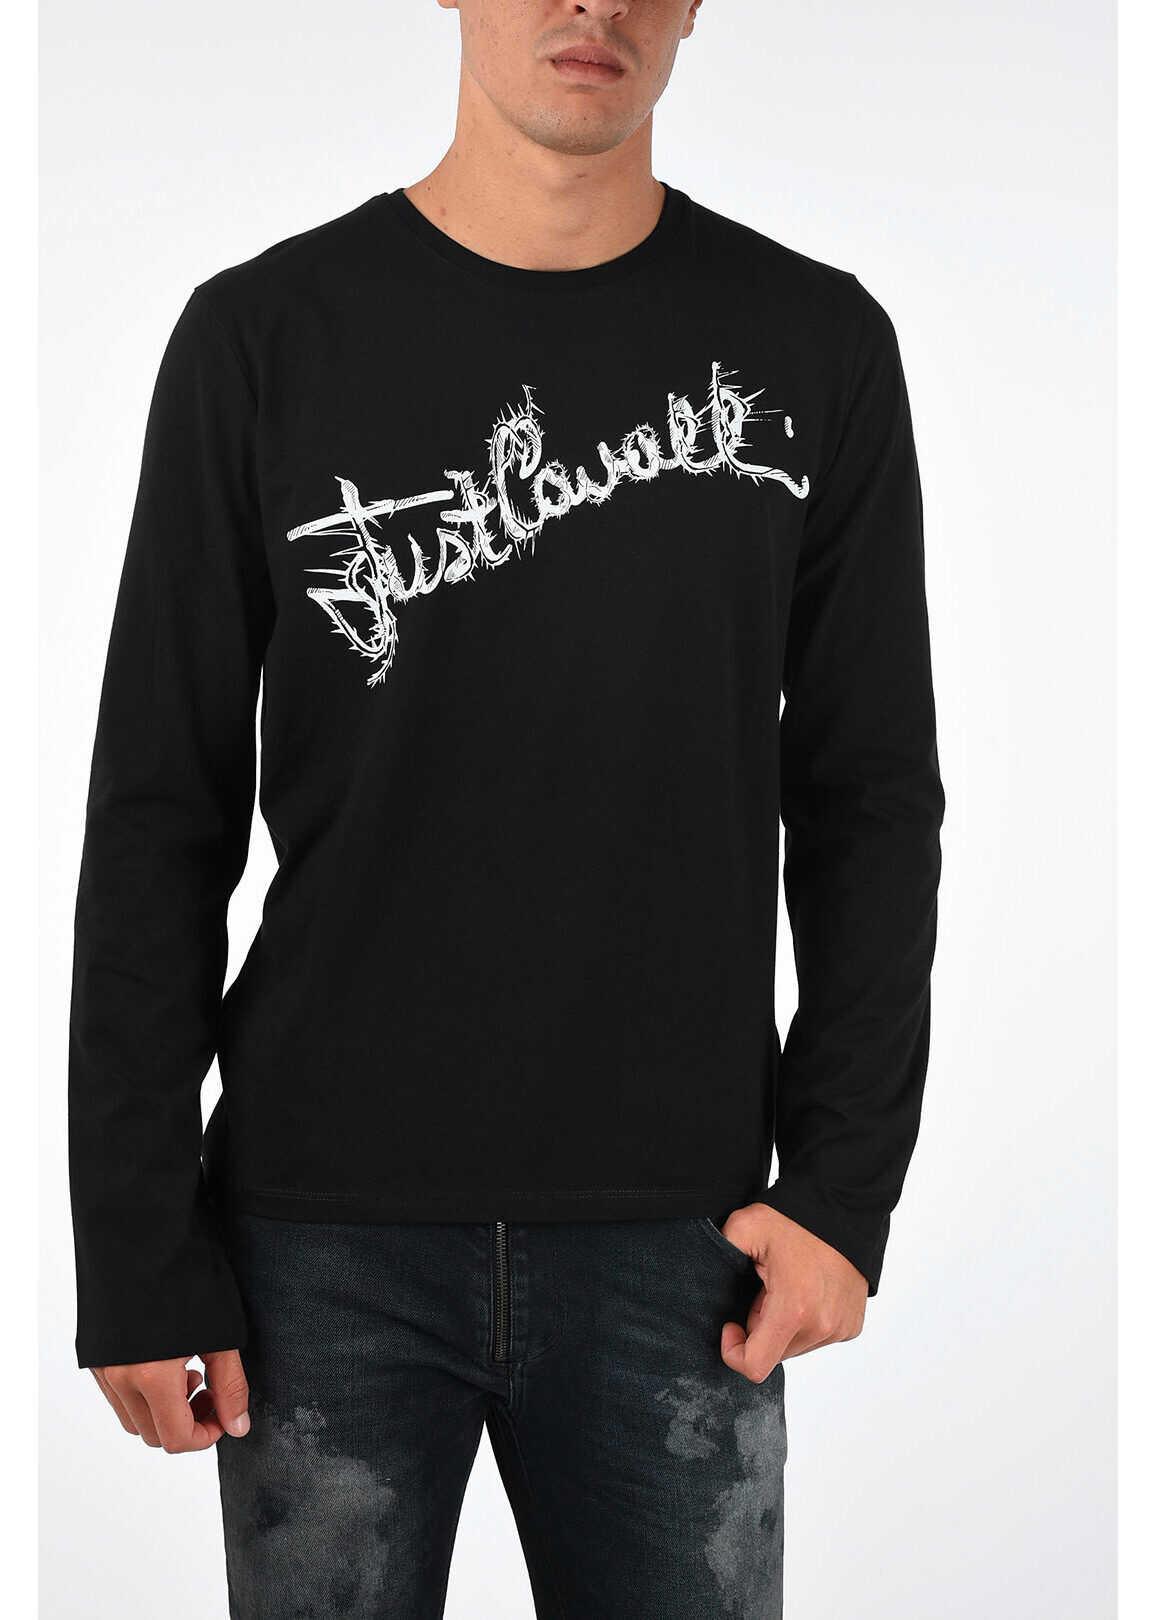 Just Cavalli Printed T-shirt BLACK